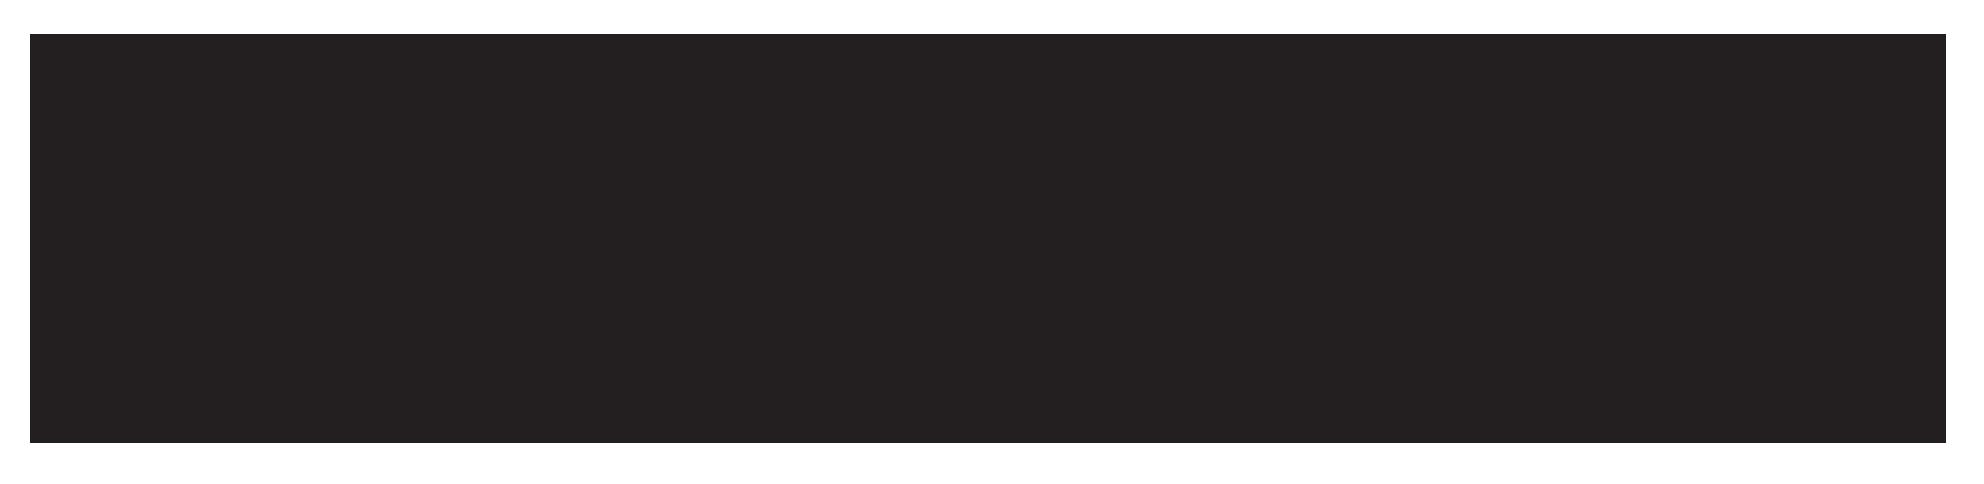 nz apparel logo.png